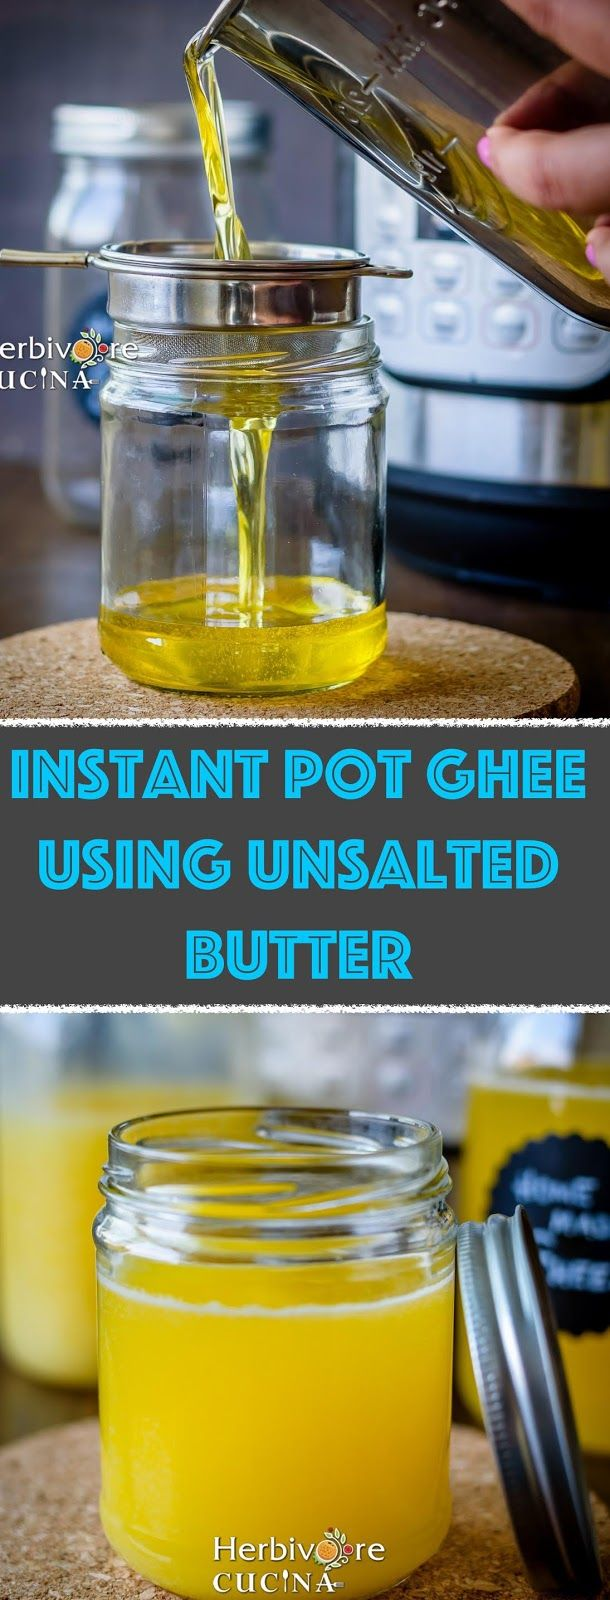 Instant Pot Ghee using Unsalted Butter